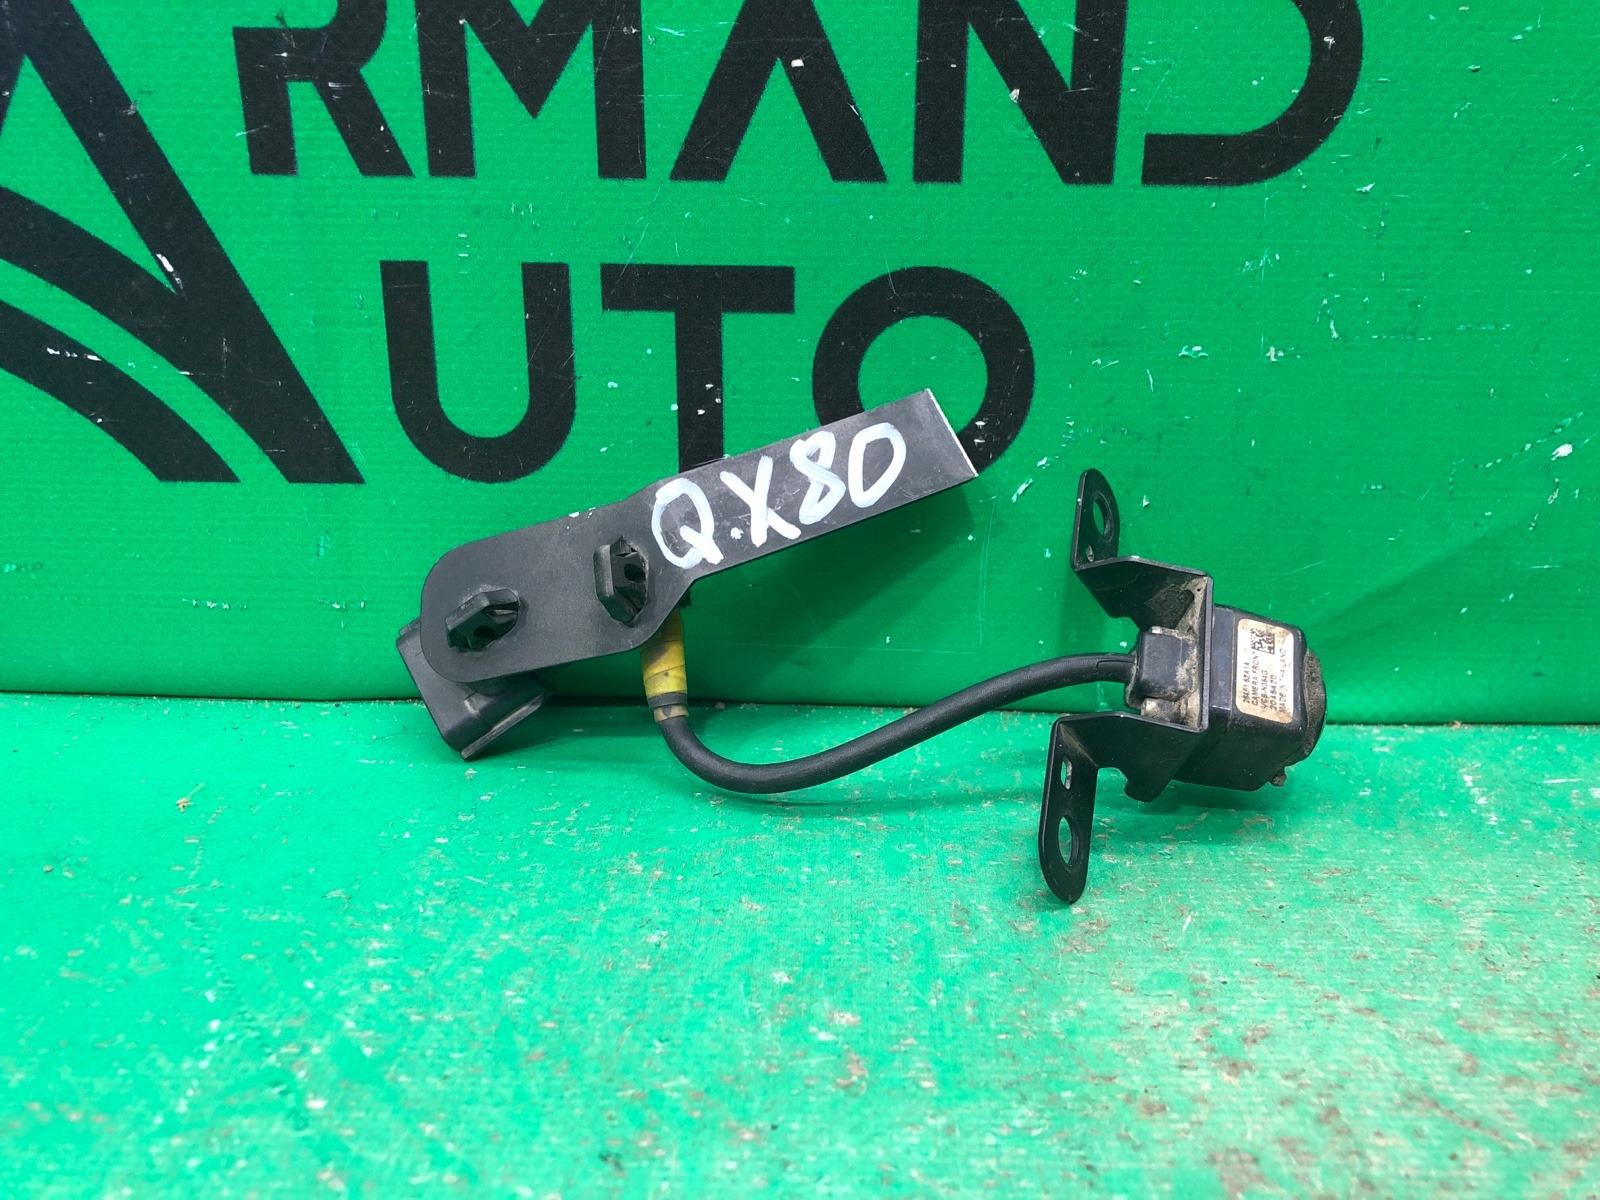 Камера решетки радиатора Infiniti Qx80 Z62 2010 (б/у)